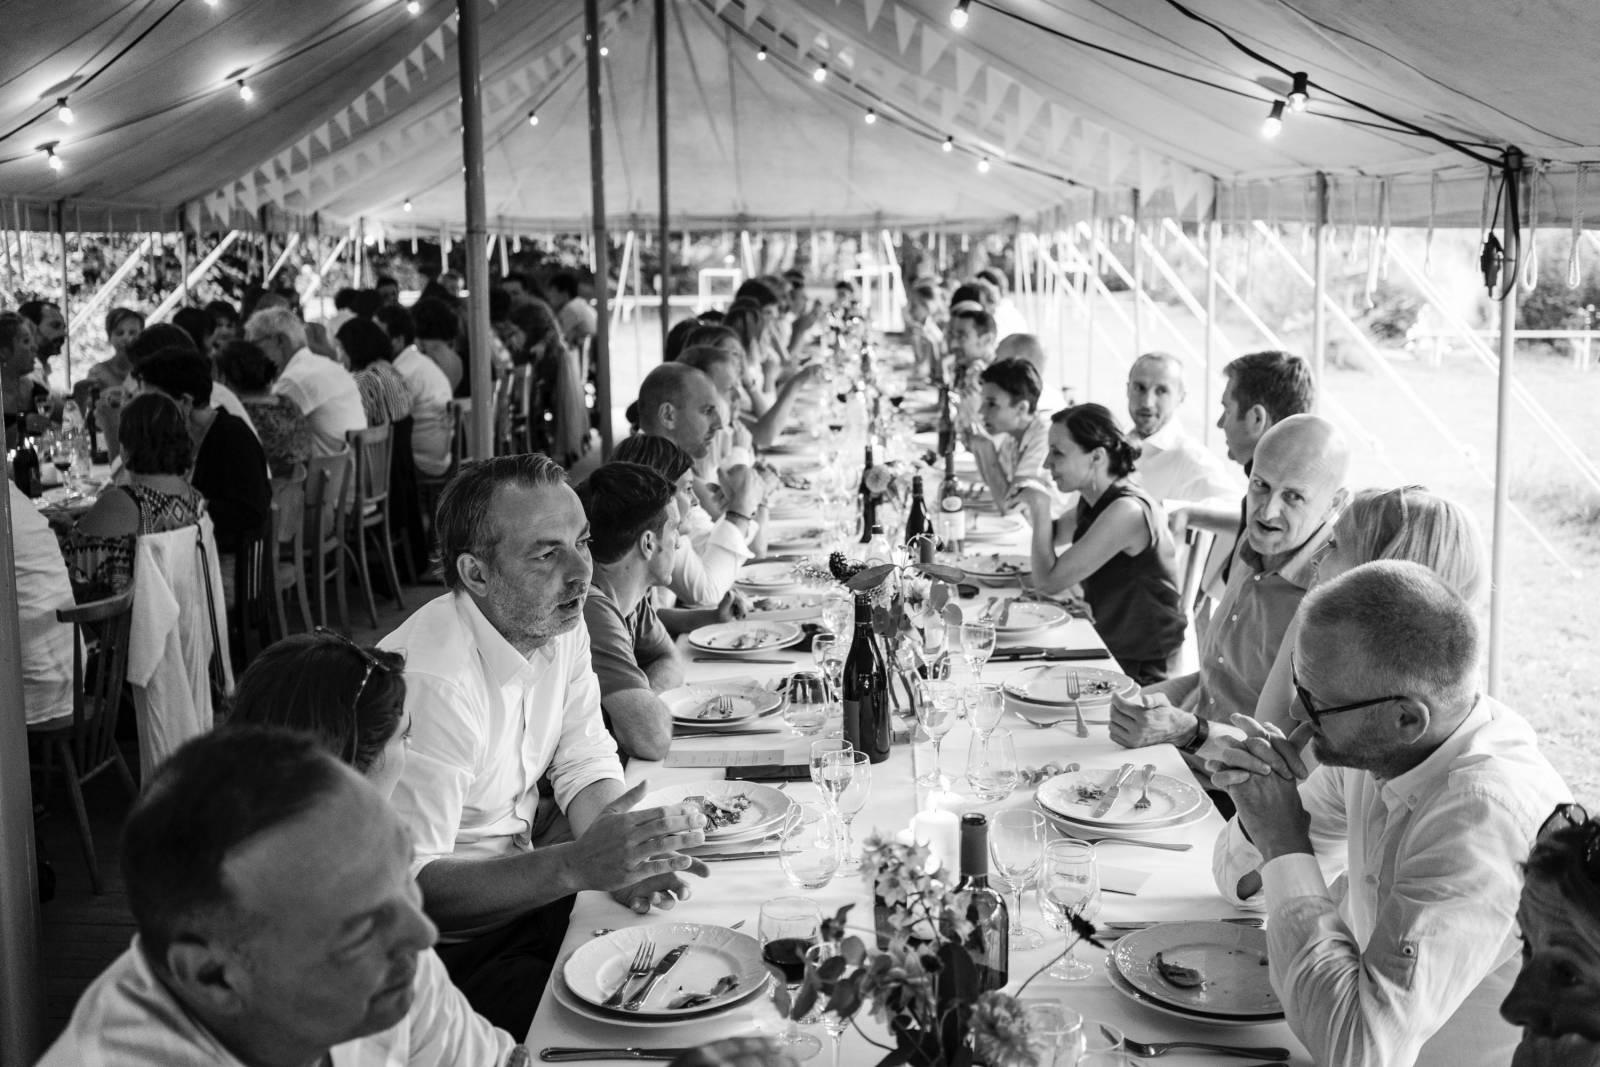 Bring it On - Catering - Fotograaf Dirk De Cubber - House of Weddings - 1